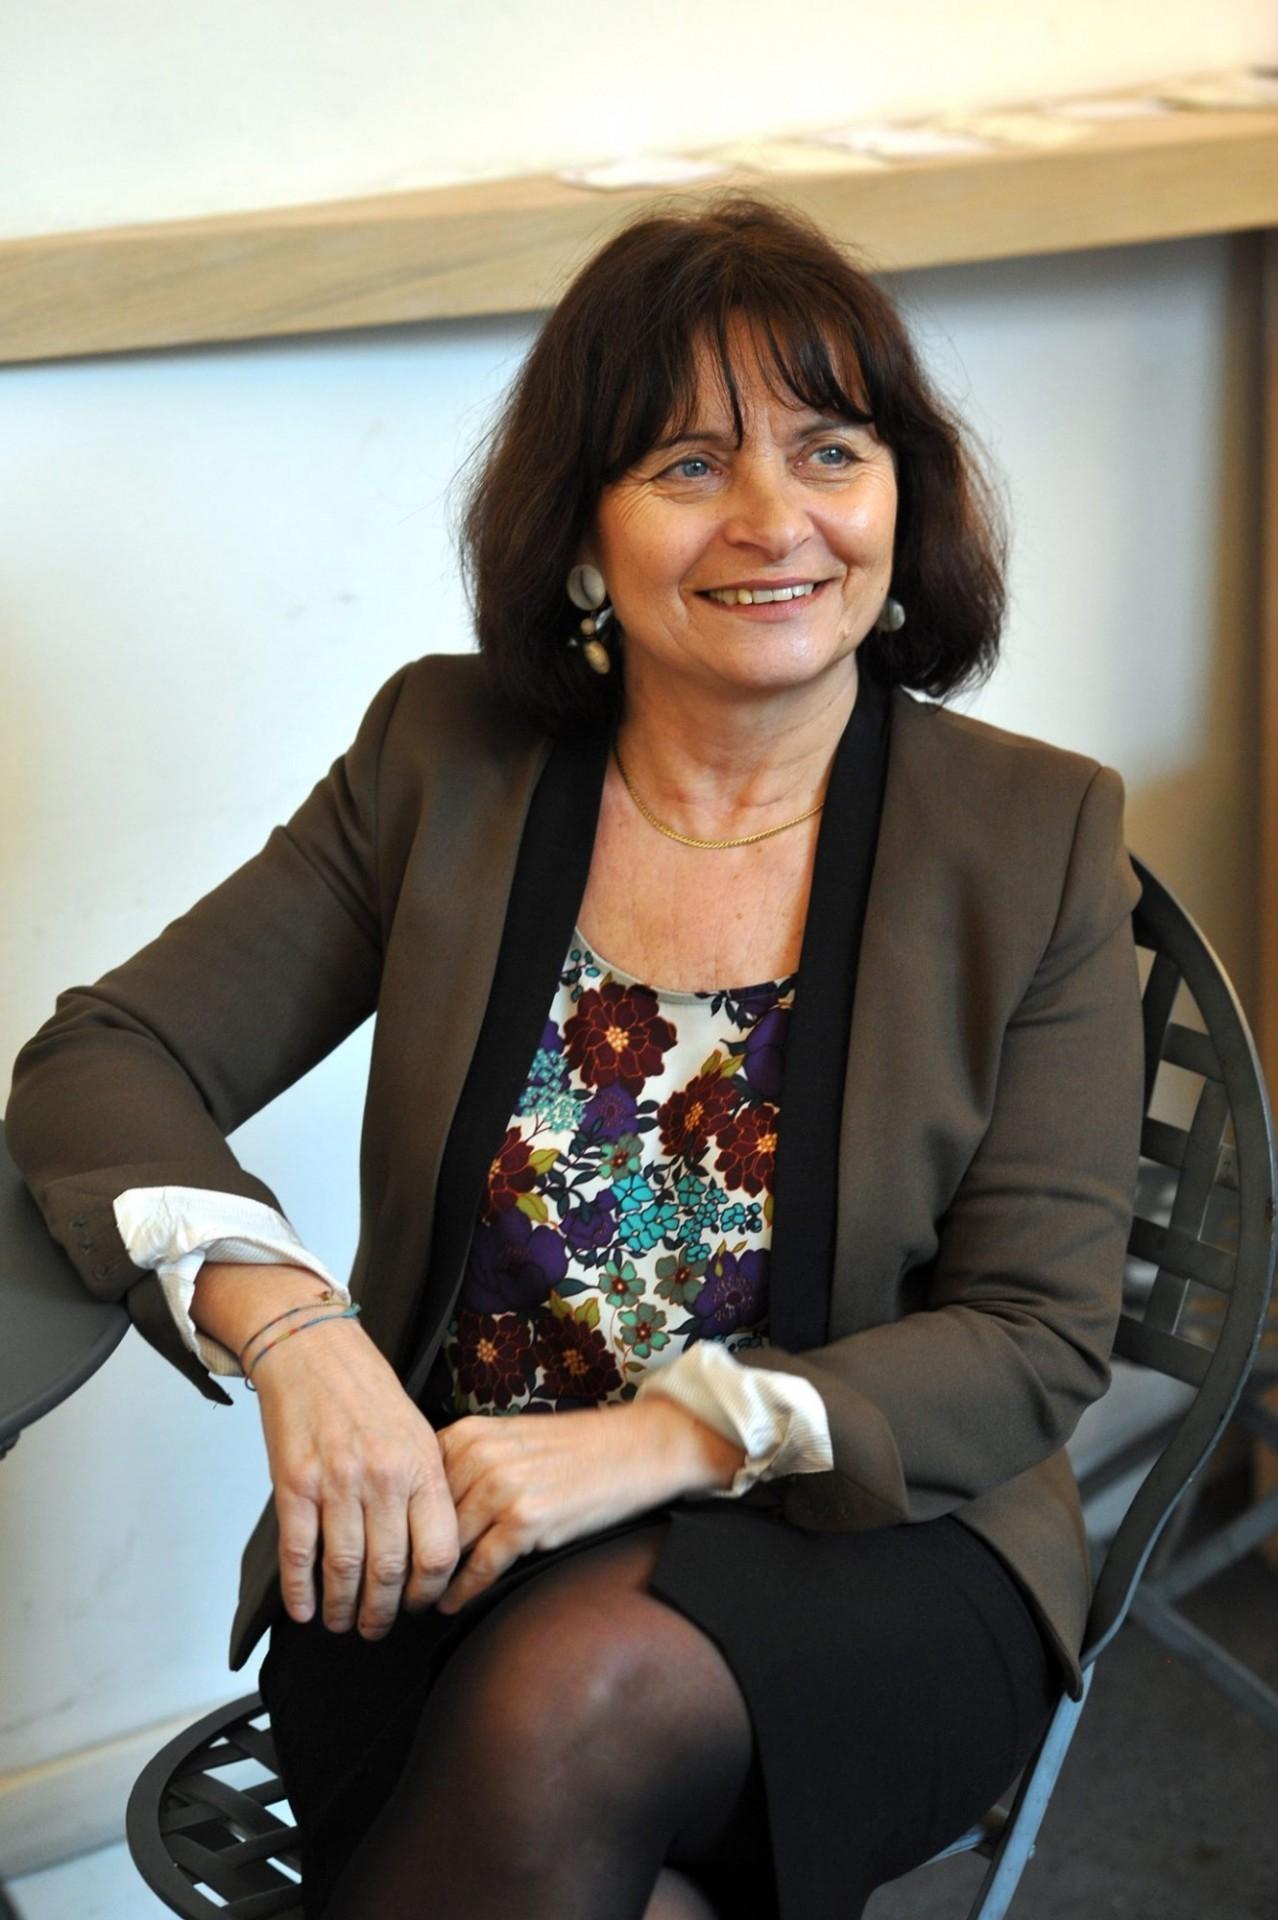 photo of Nadia Urbinati